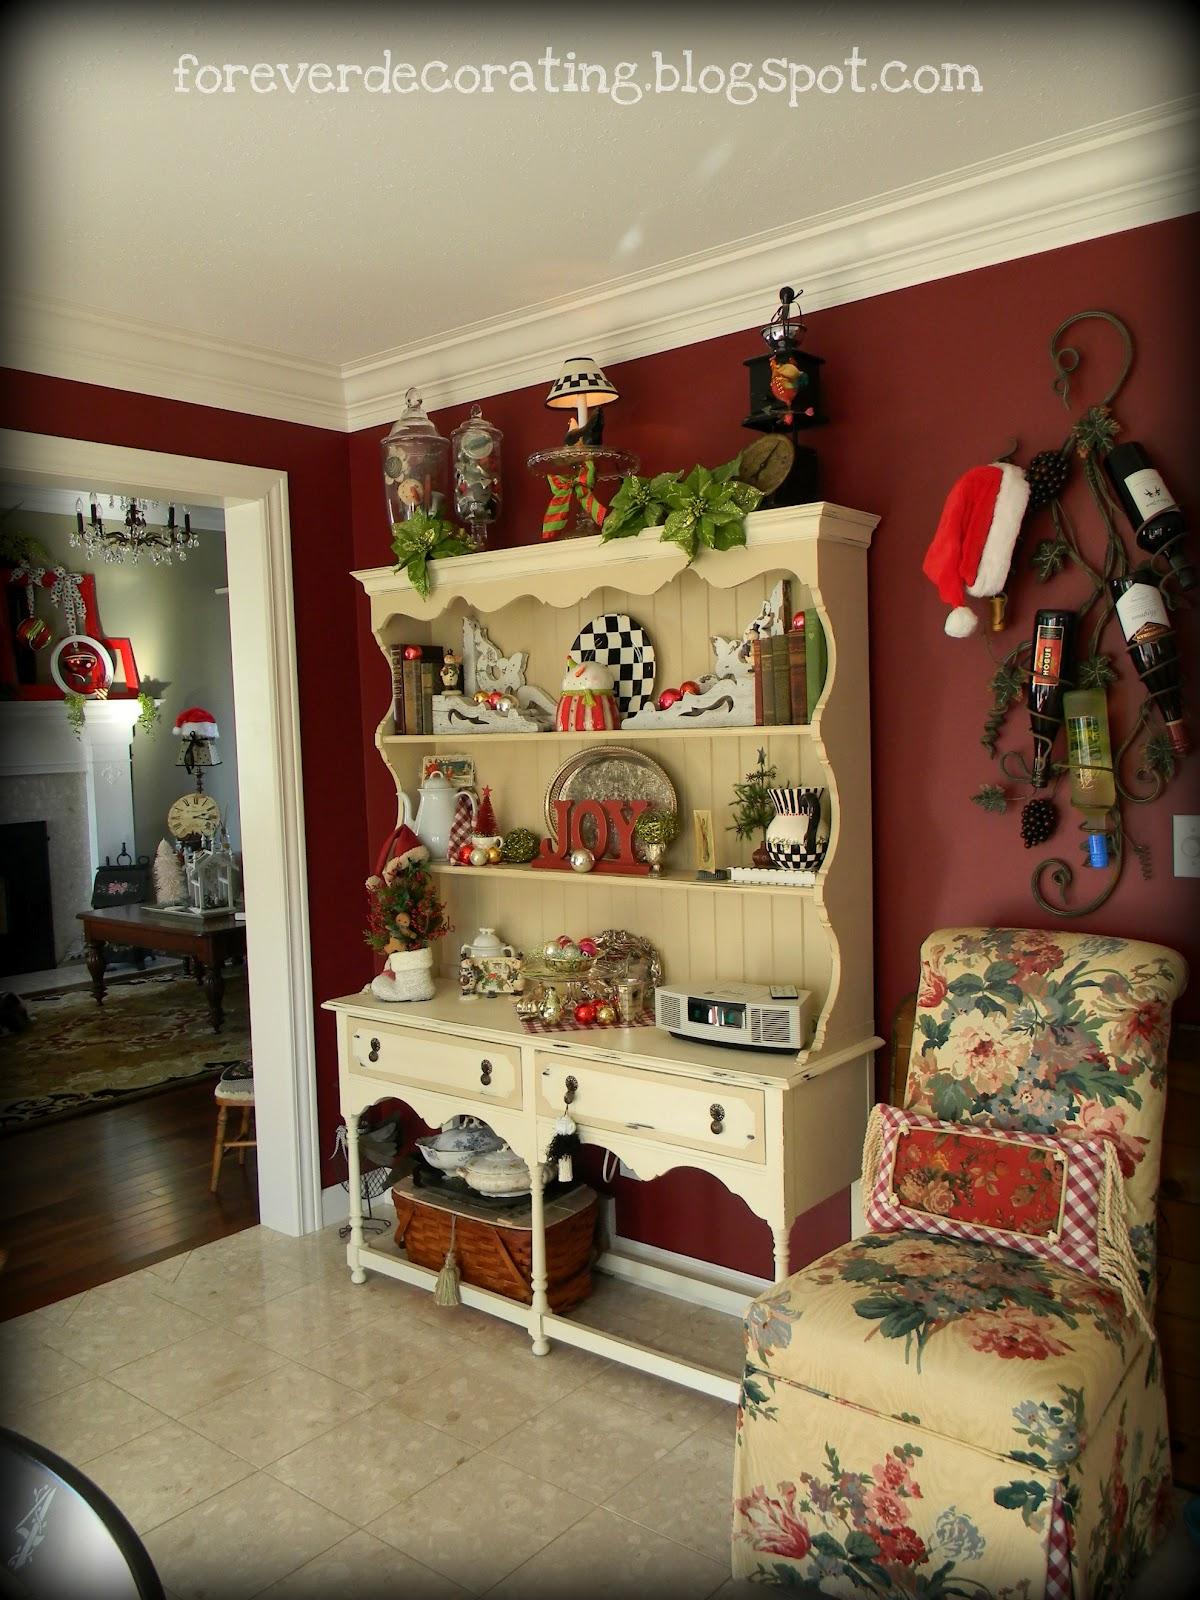 Forever Decorating Hutch Decor 101107